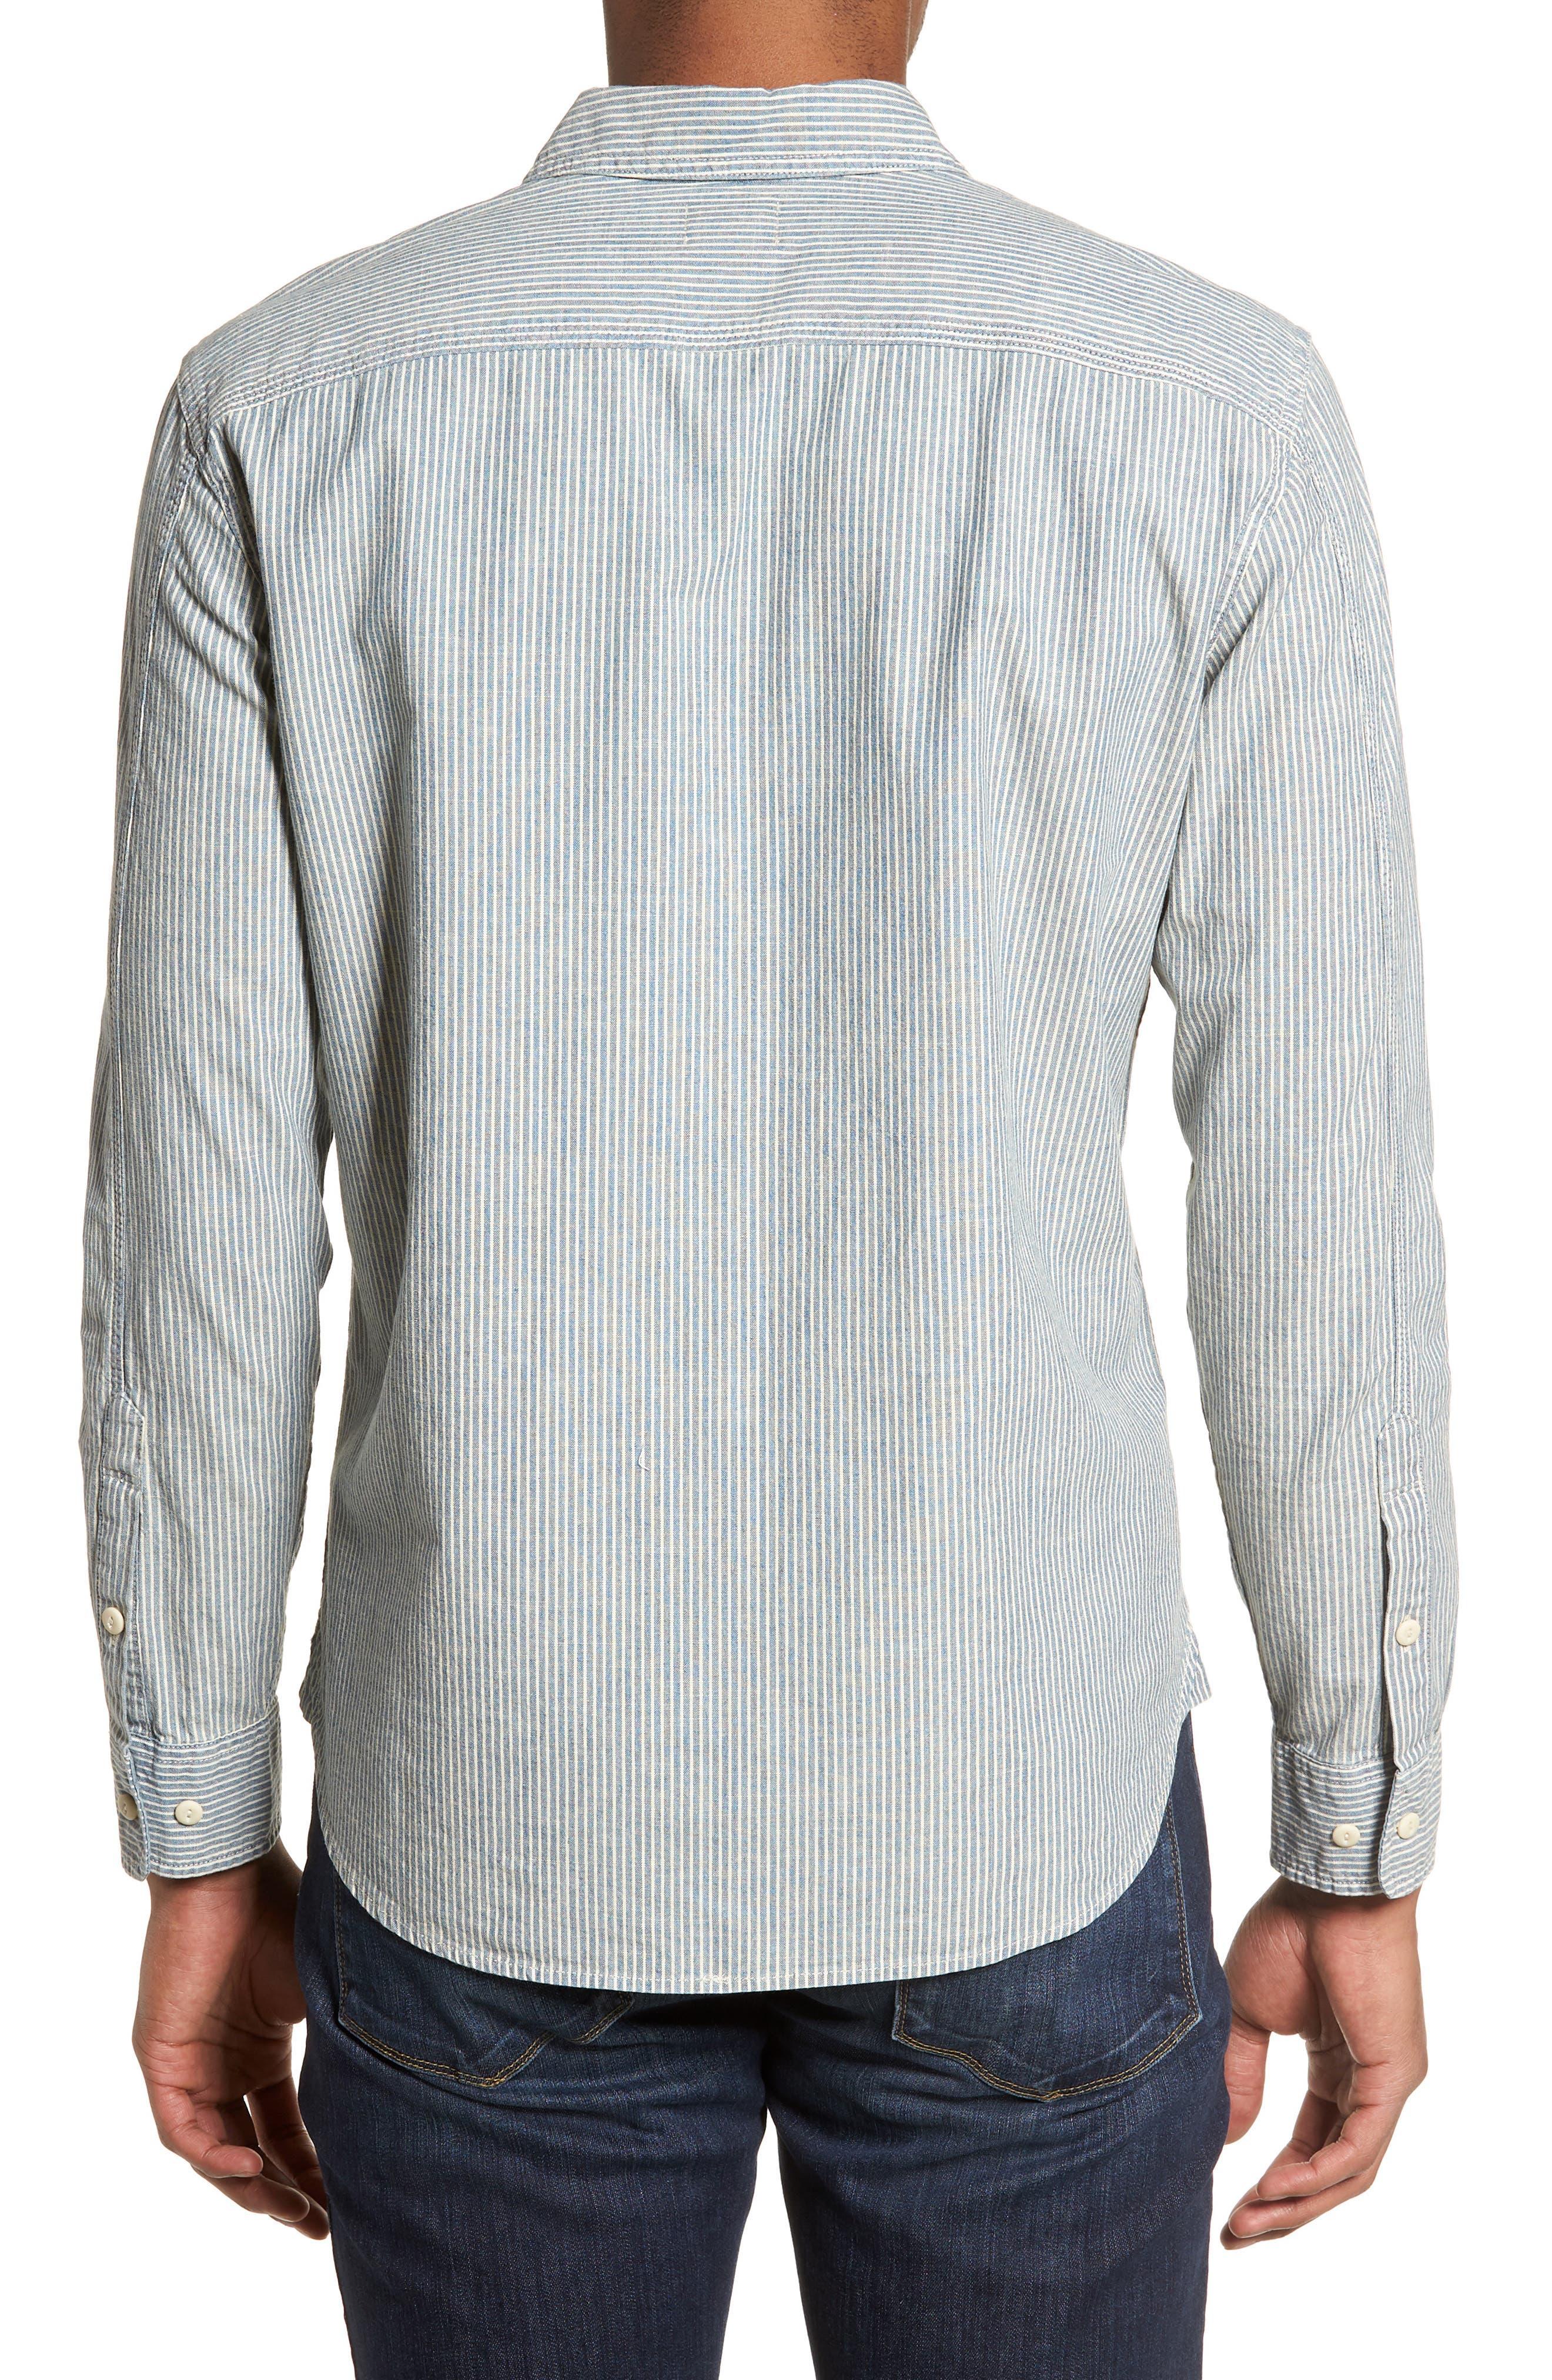 Nelson Slim Fit Stripe Sport Shirt,                             Alternate thumbnail 3, color,                             Indigo/ White Stripe